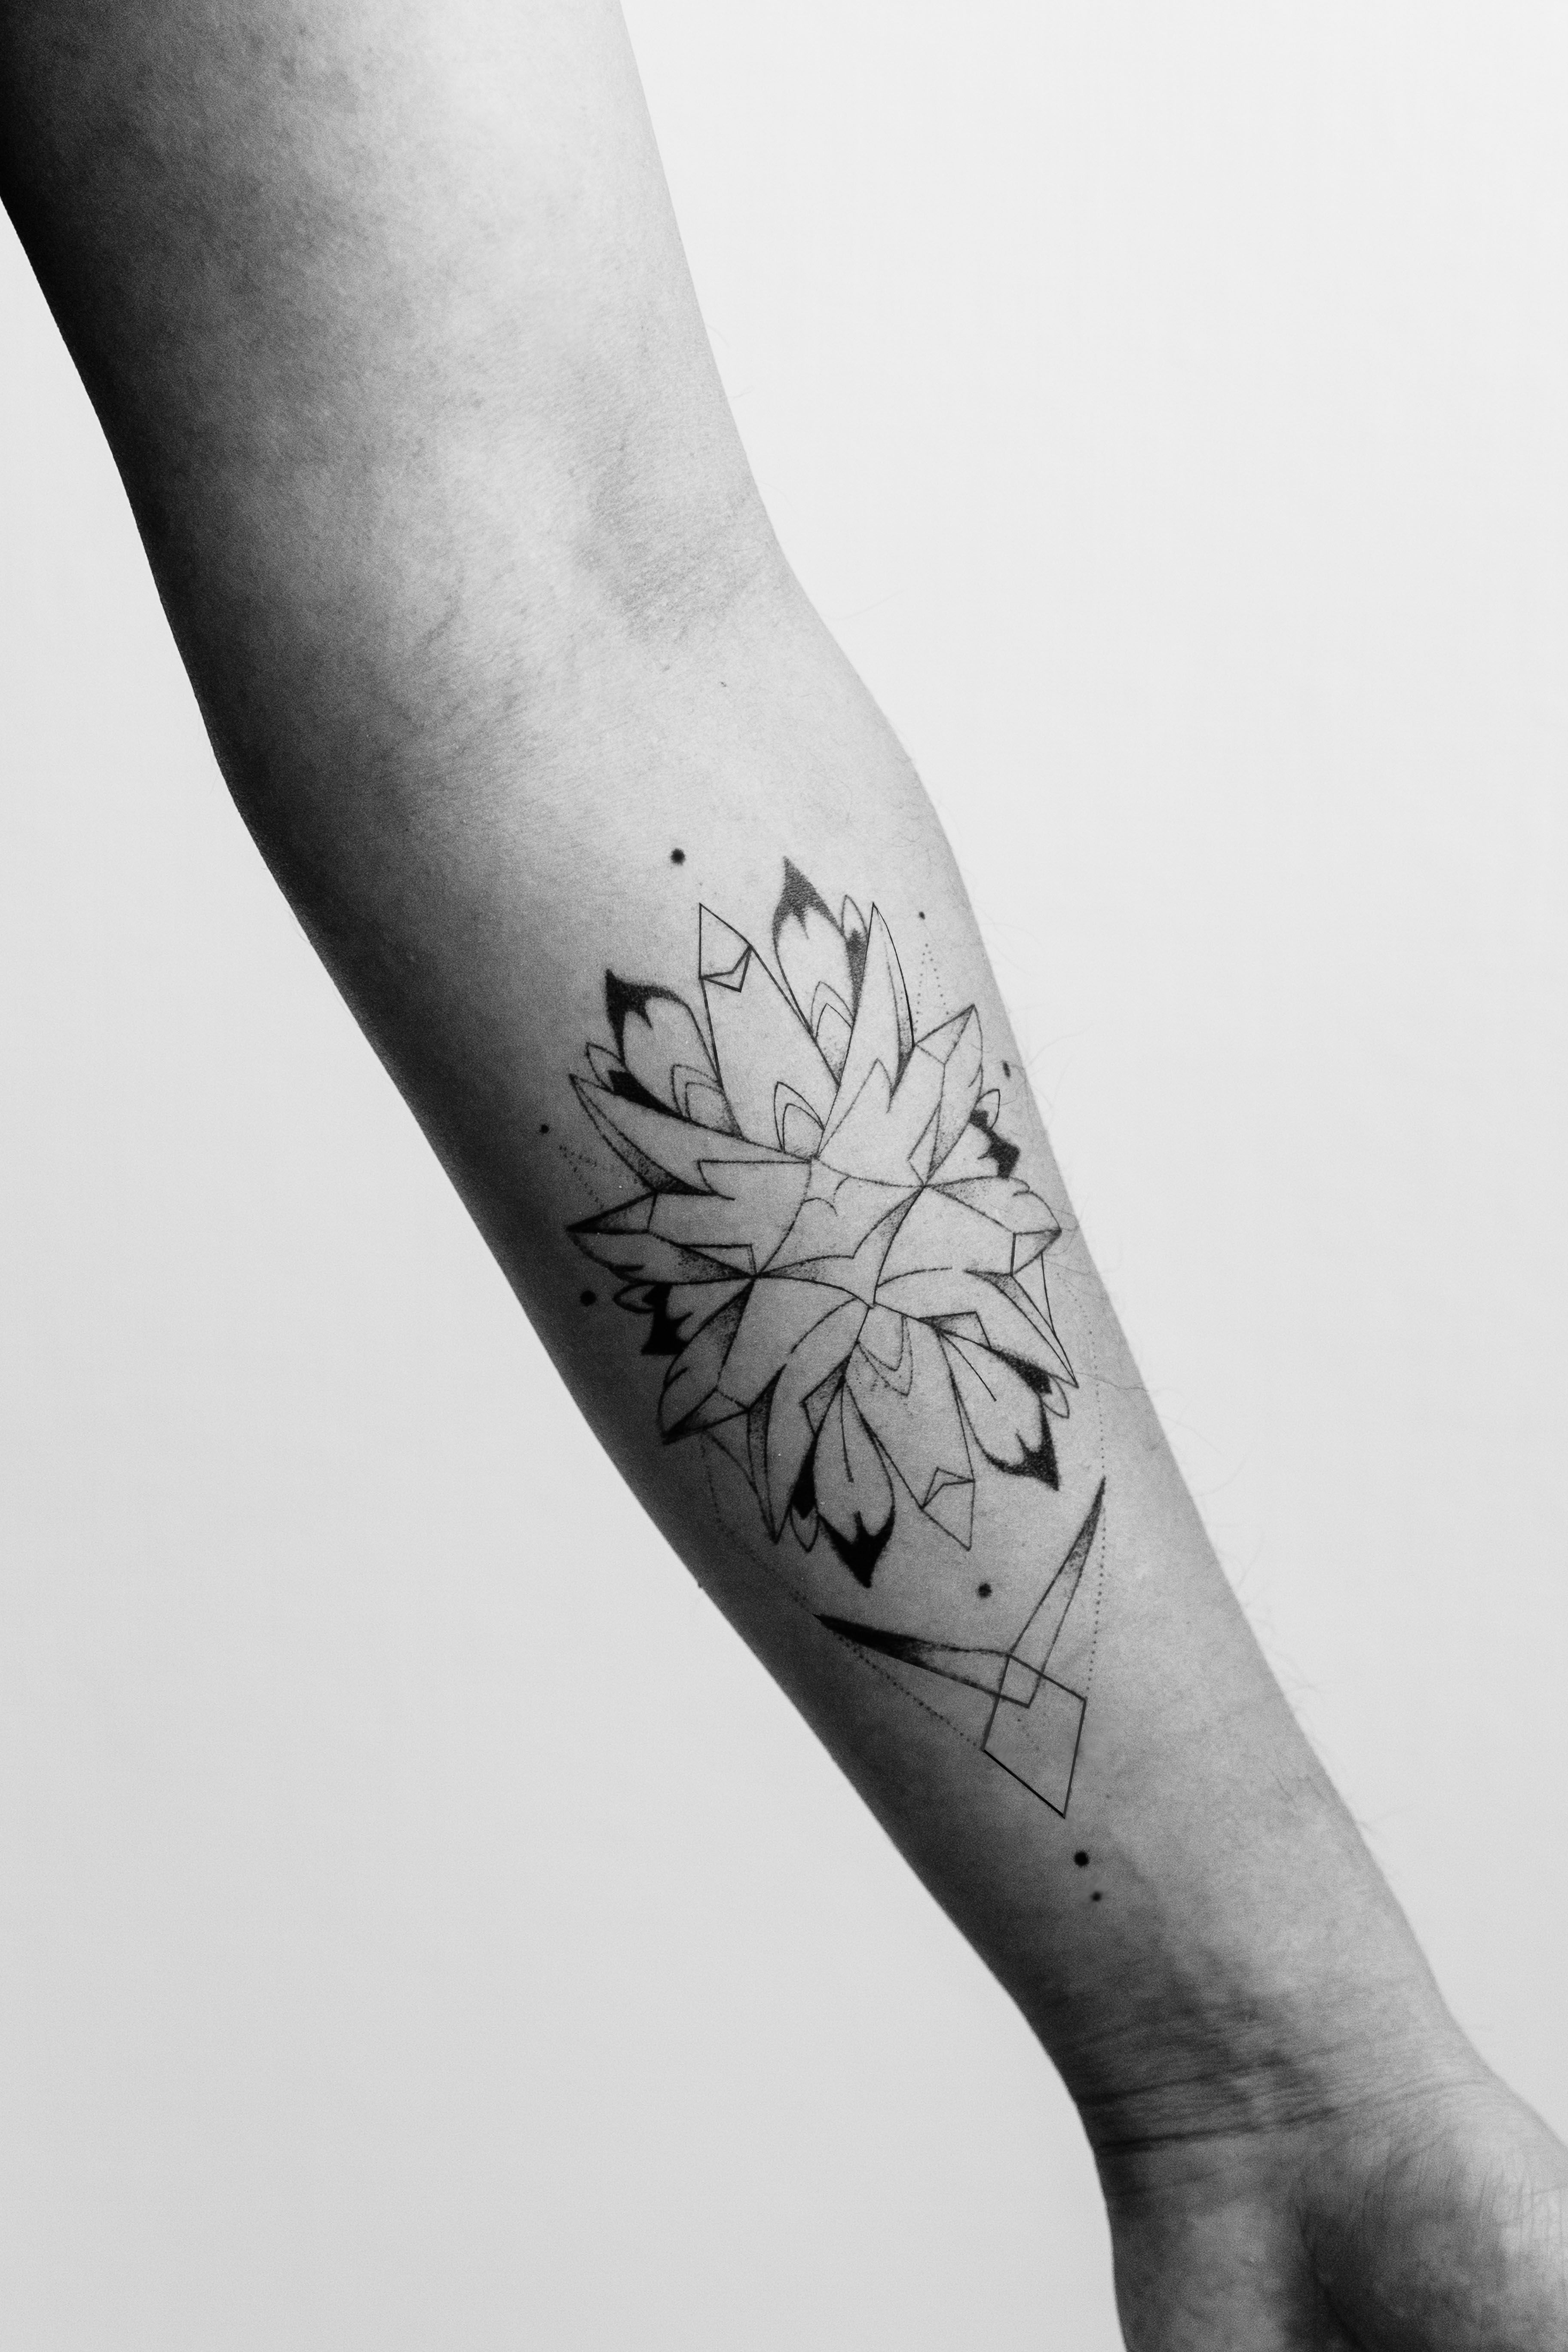 Vegetal Tattoo Www Lapeaudure Fr Hello Lapeaudure Fr Lapeaudure